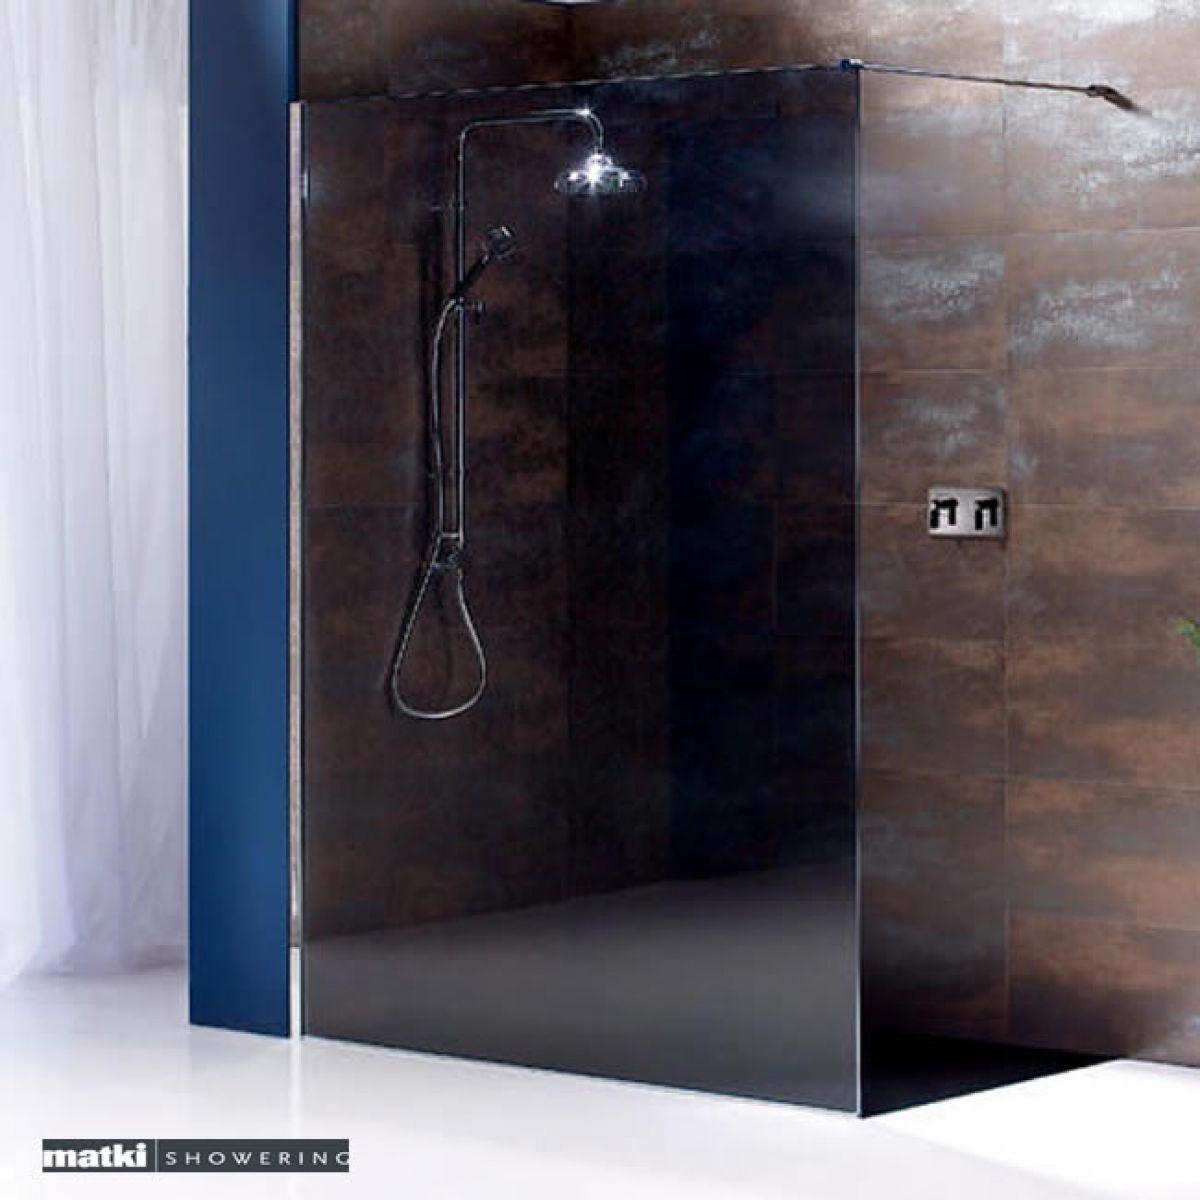 matki straight wet room shower panel